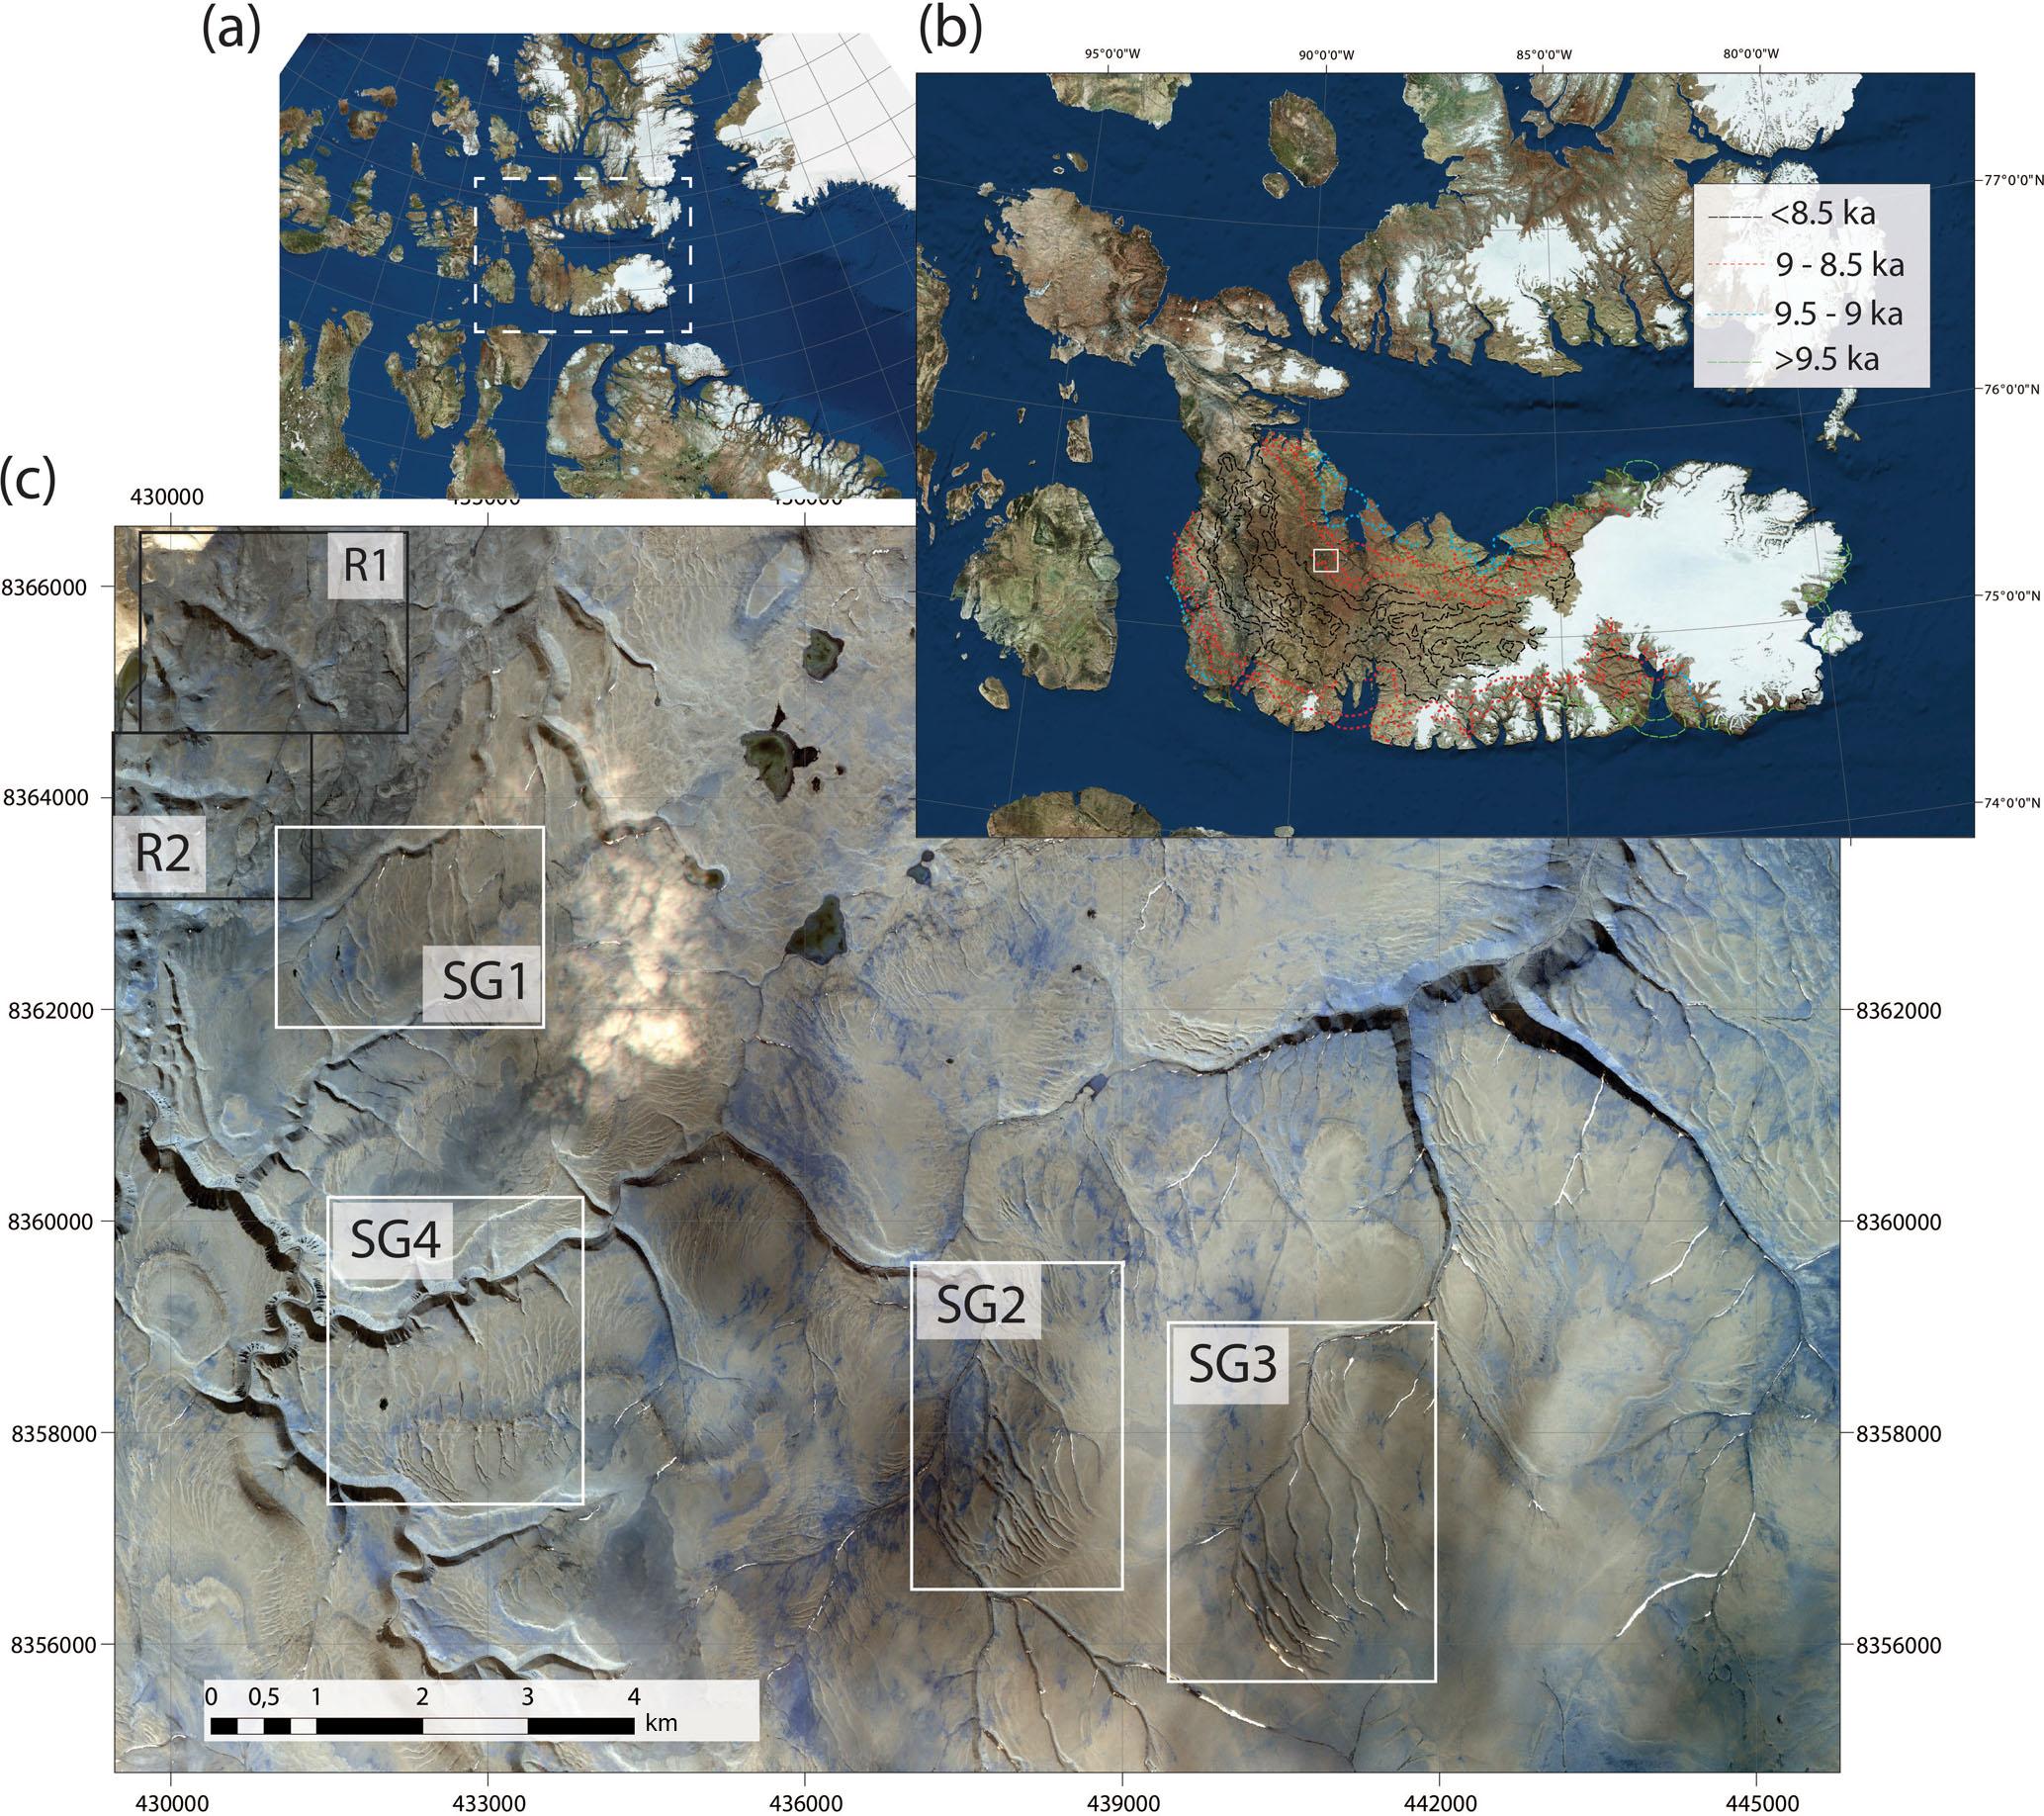 Subglacial Drainage Patterns Of Devon Island, Canada